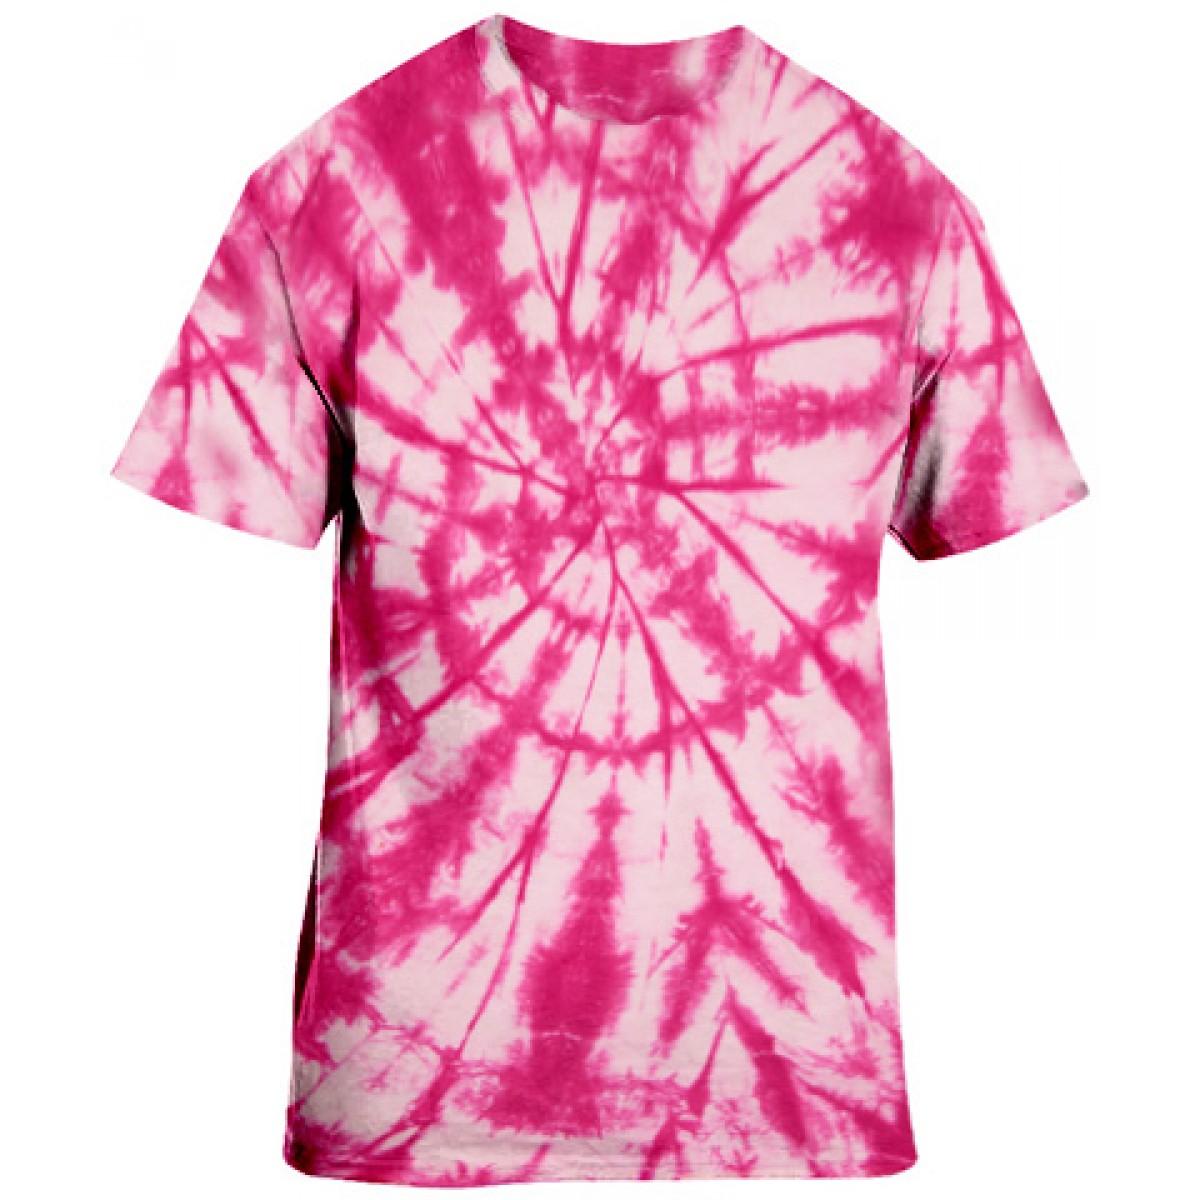 Pink Tie-Dye S/S Tee -Pink-2XL